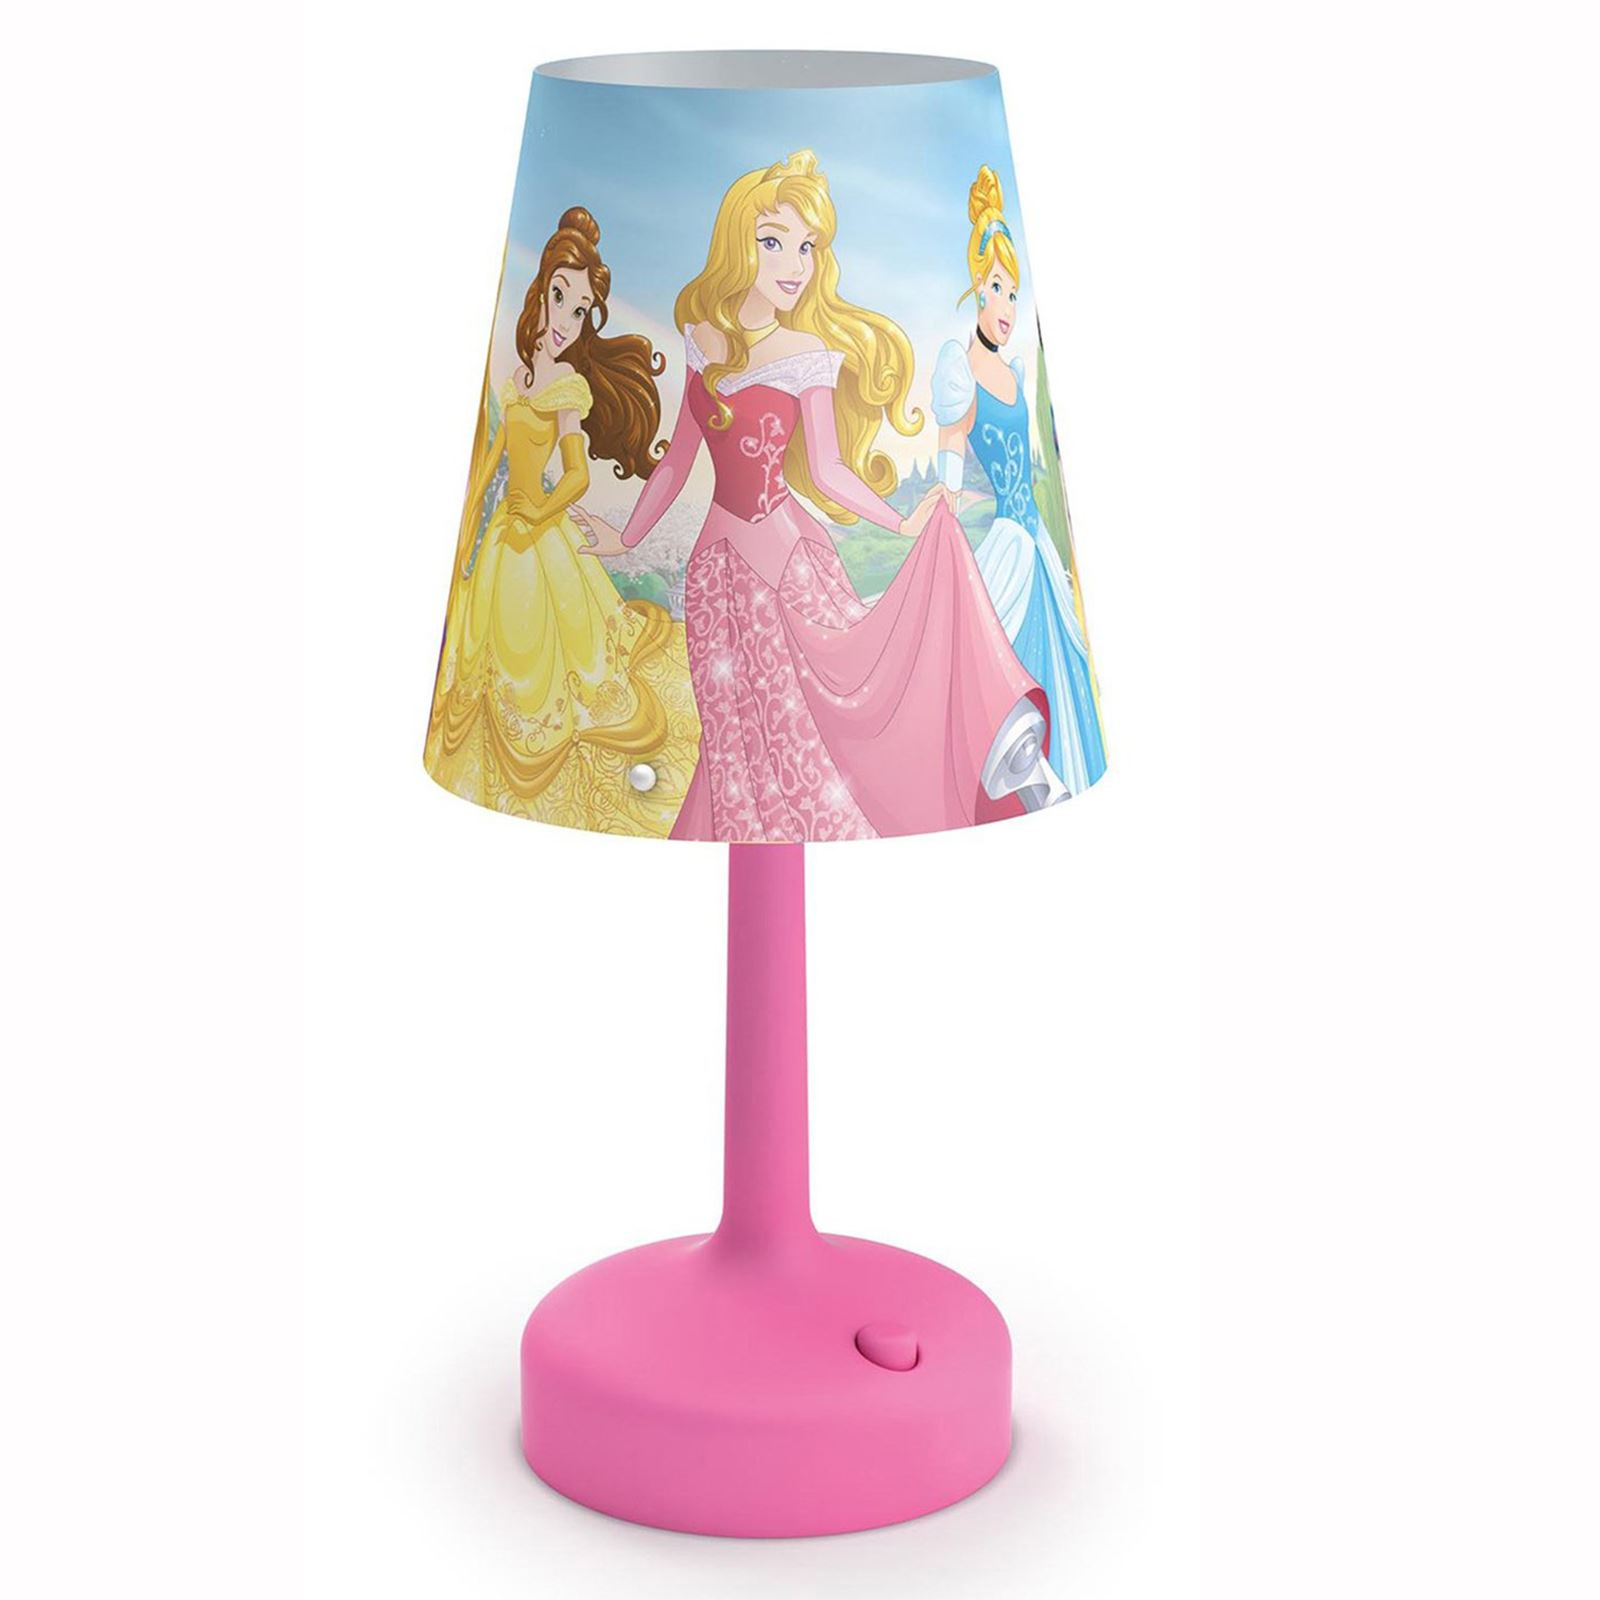 PHILIPS KIDS BED SIDE LAMPS VARIOUS DESIGNS LIGHTING BEDROOM STAR - Lamps for kids bedrooms